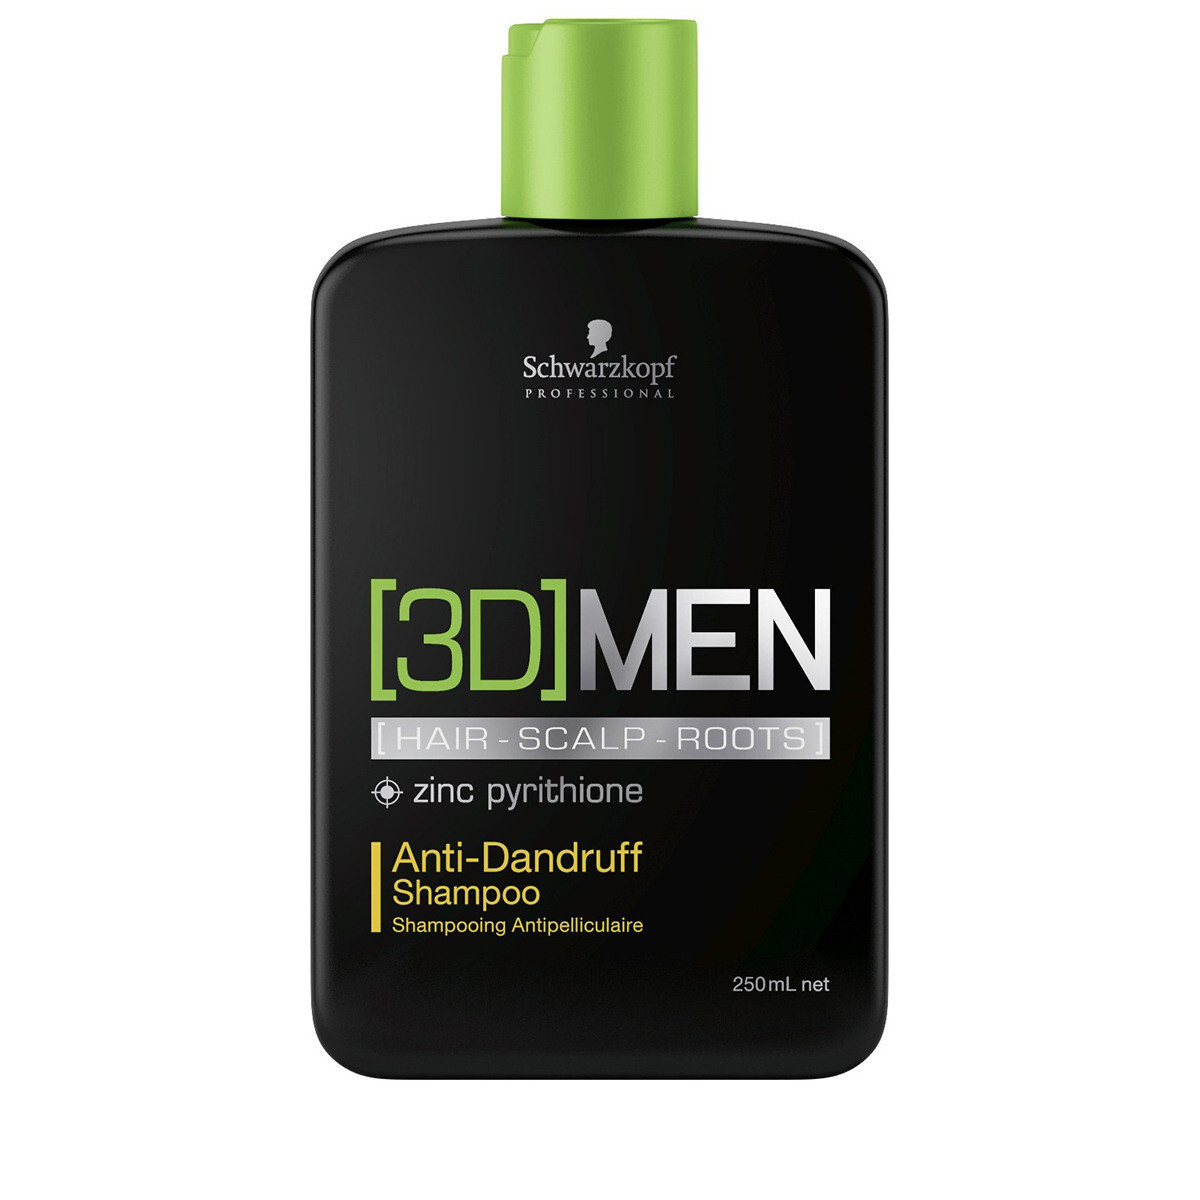 SCHWARZKOPF PROF. [3D]MENSION Anti-Dandruff Shampoo SIZE 250ml